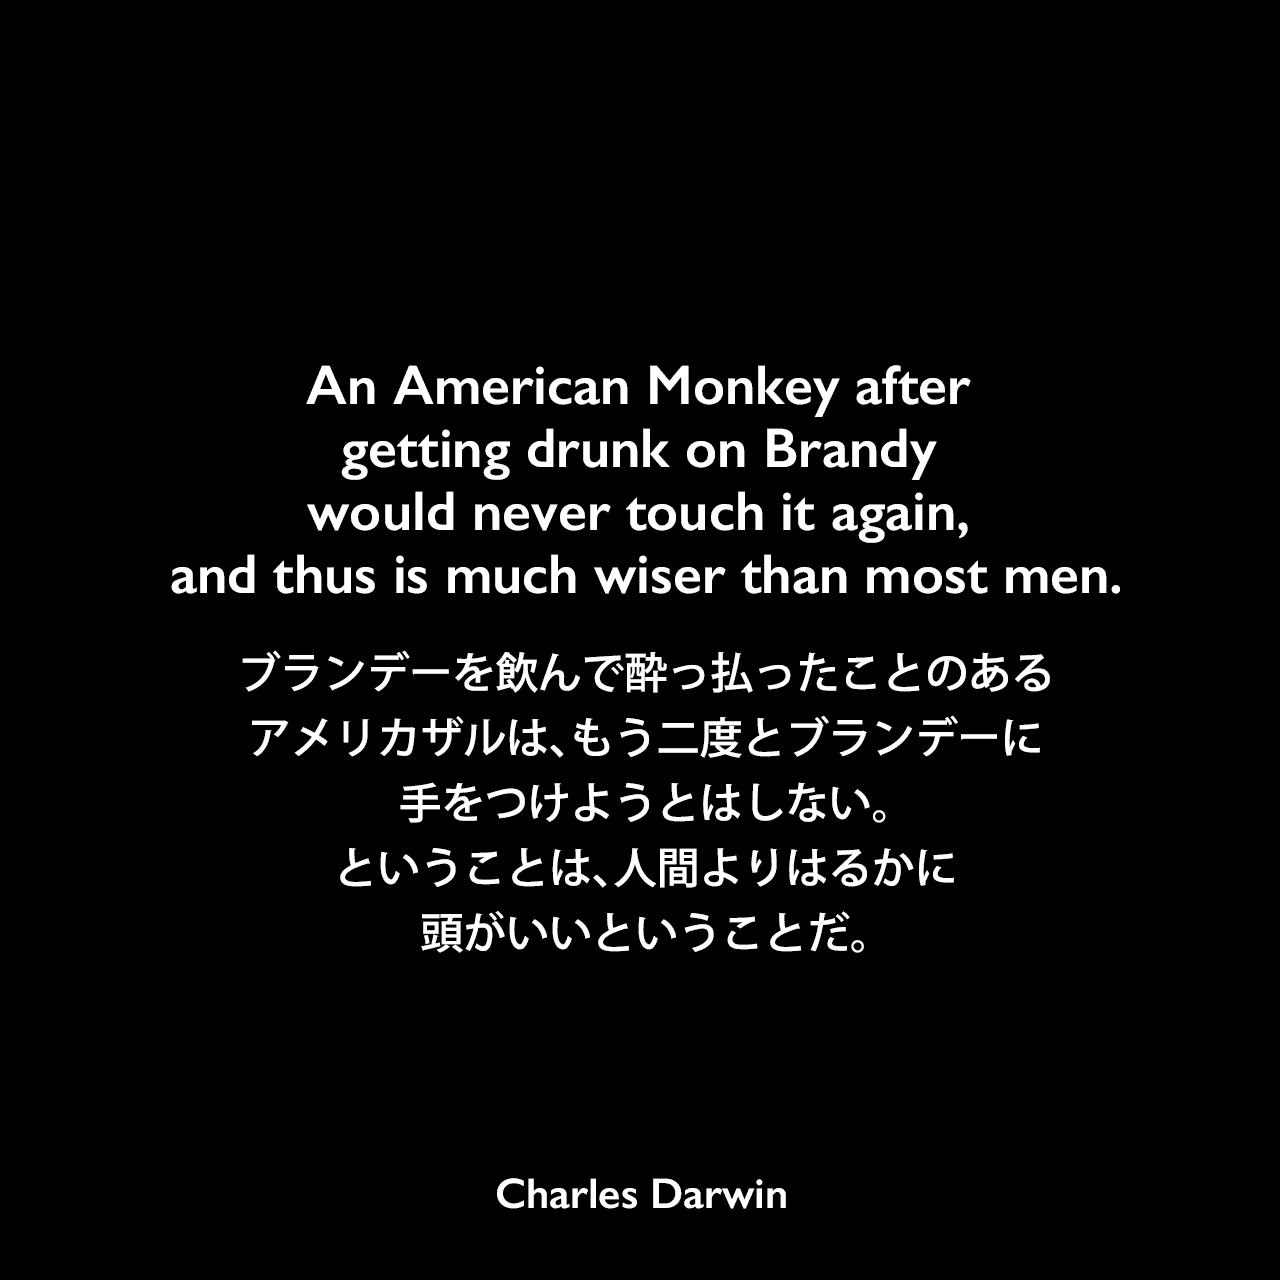 An American Monkey after getting drunk on Brandy would never touch it again, and thus is much wiser than most men.ブランデーを飲んで酔っ払ったことのあるアメリカザルは、もう二度とブランデーに手をつけようとはしない。ということは、人間よりはるかに頭がいいということだ。Charles Darwin